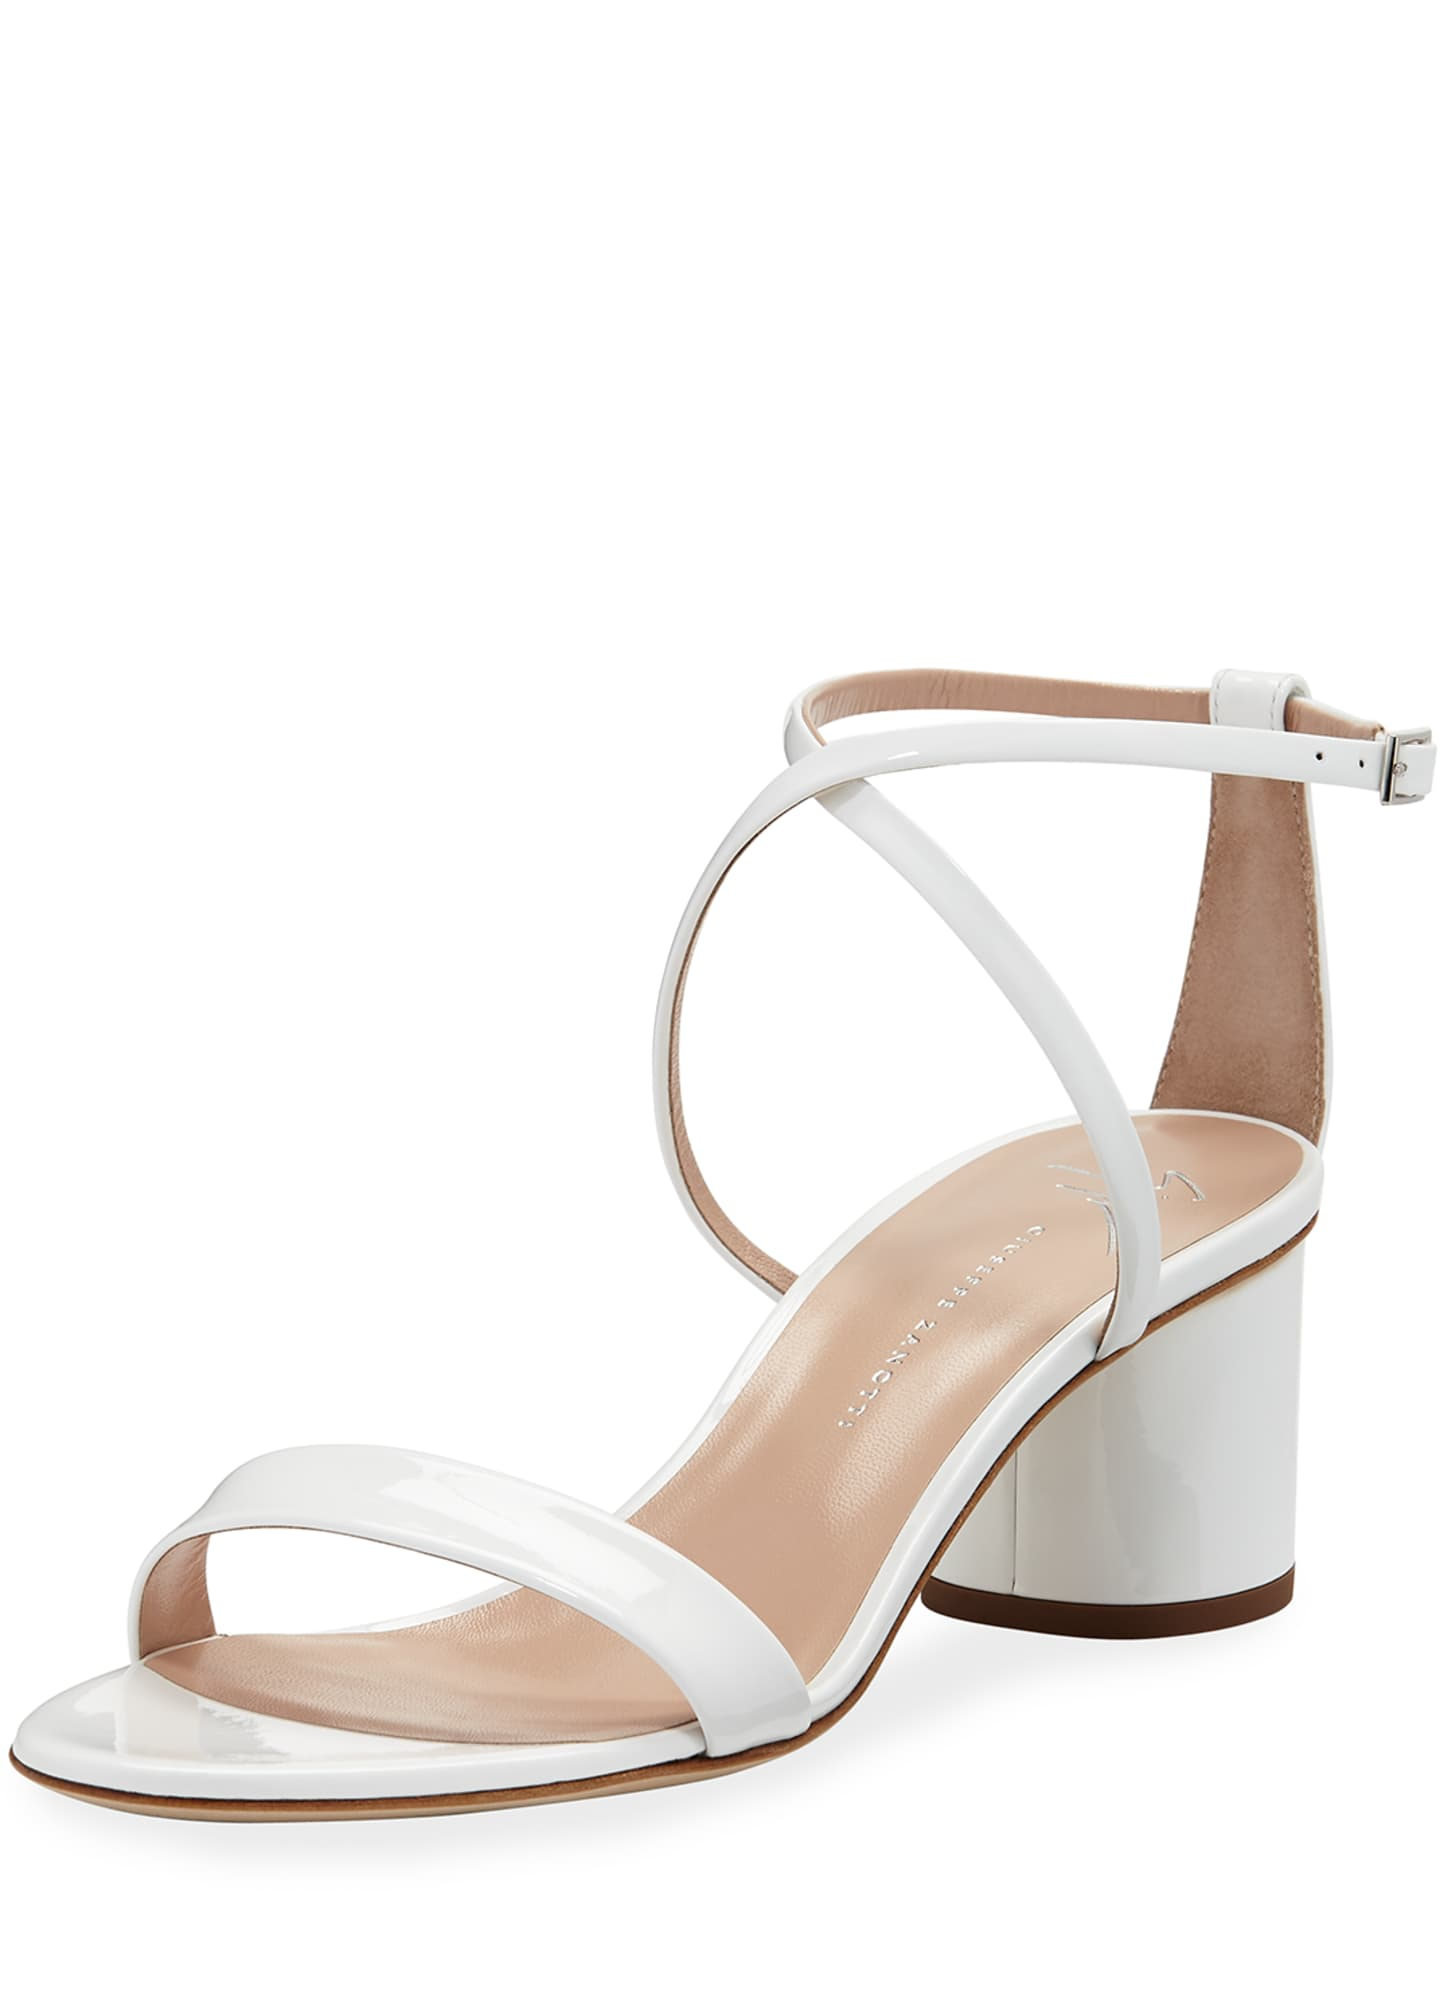 Giuseppe Zanotti Patent Leather Crisscross Sandals